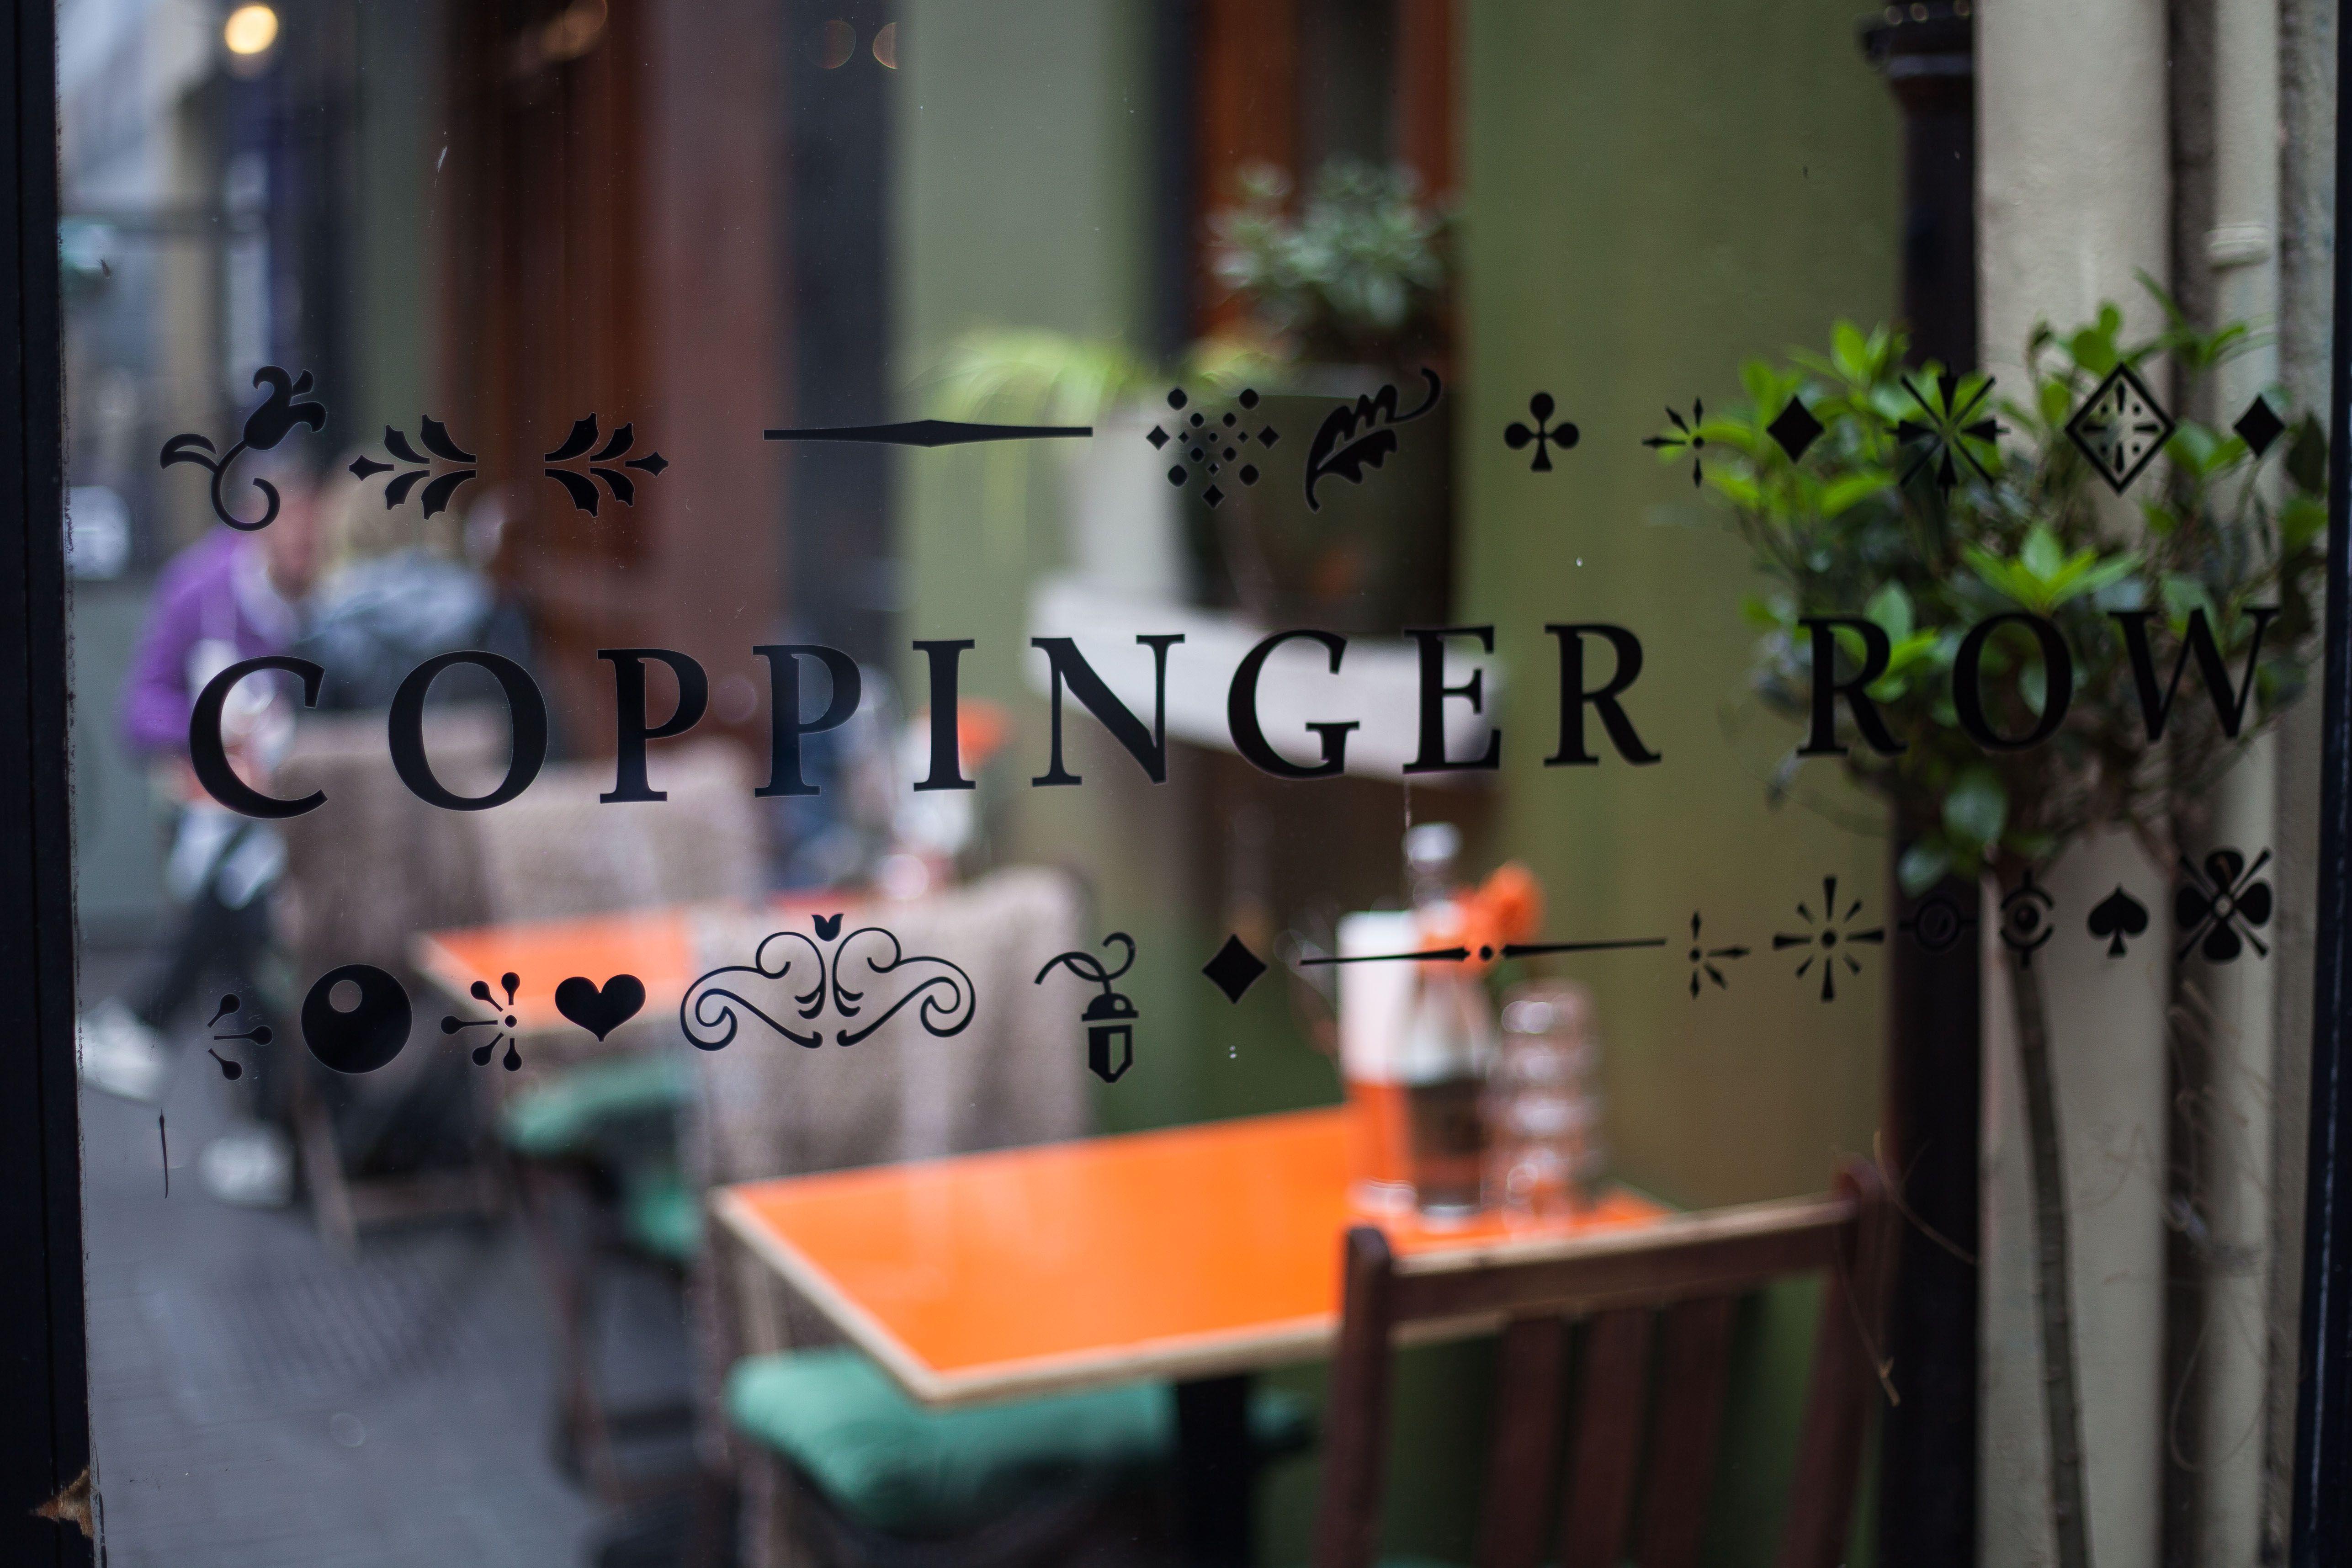 LD Coppinger Row-81